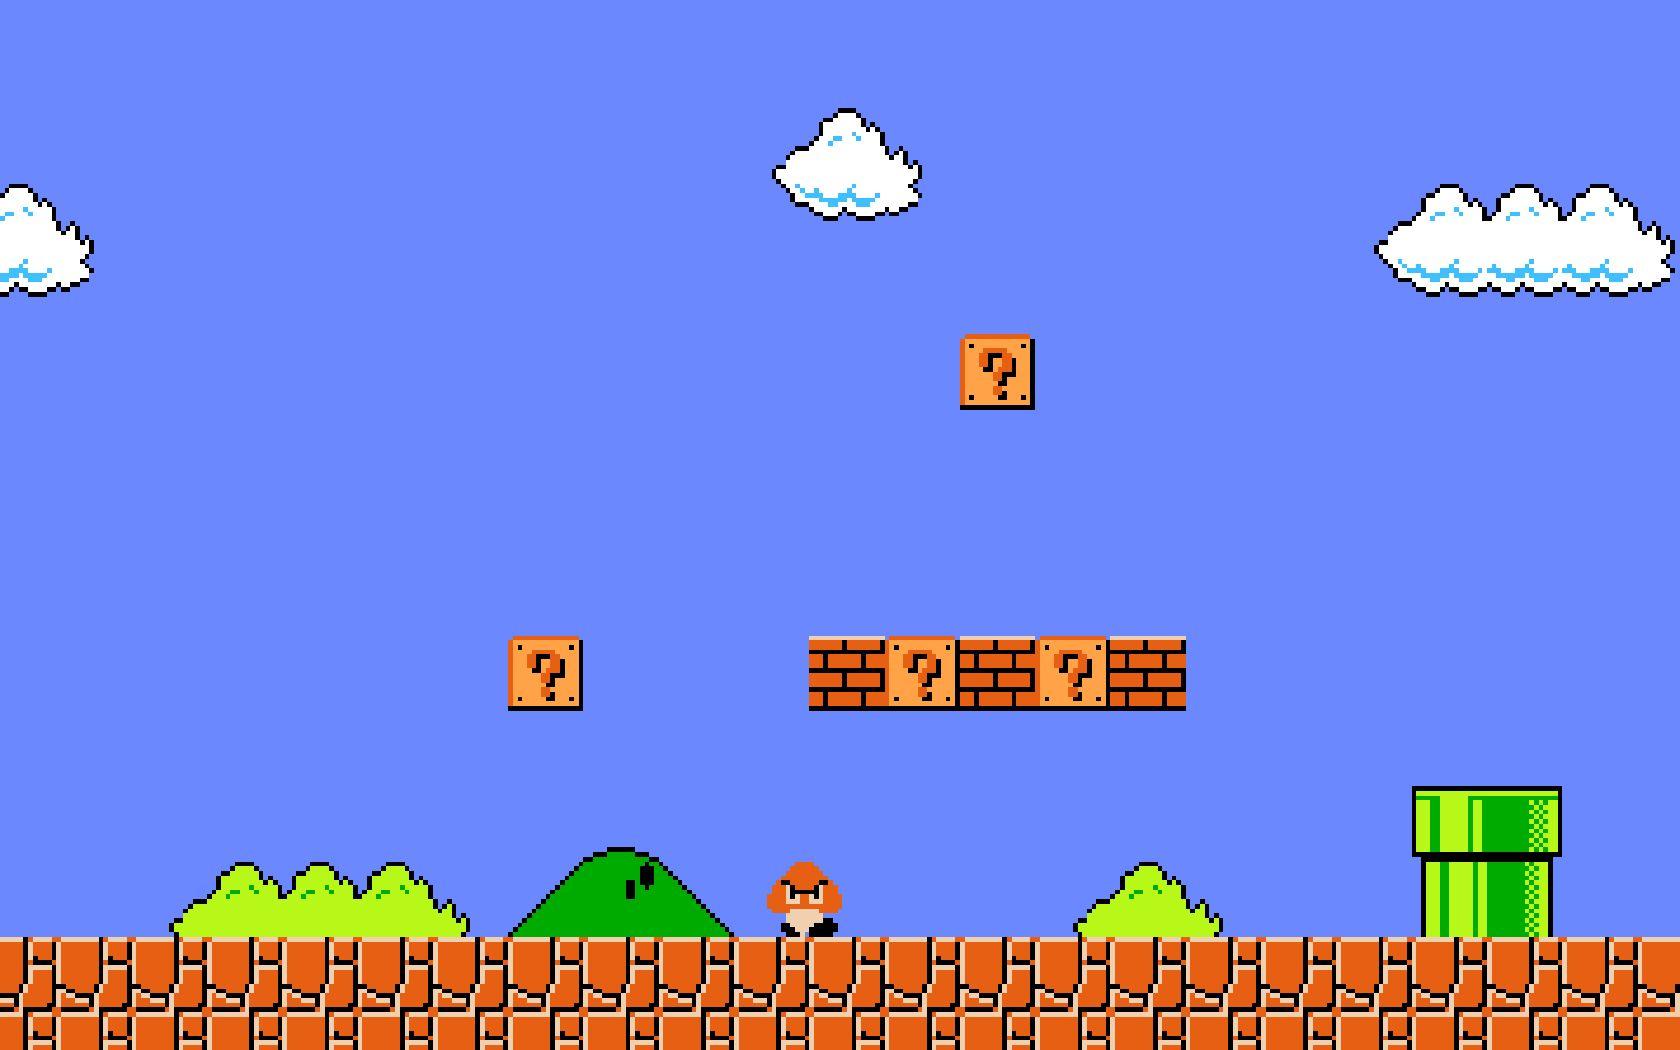 Mario Desktop Backgrounds: Super Mario Bros. 3 Computer Wallpapers, Desktop